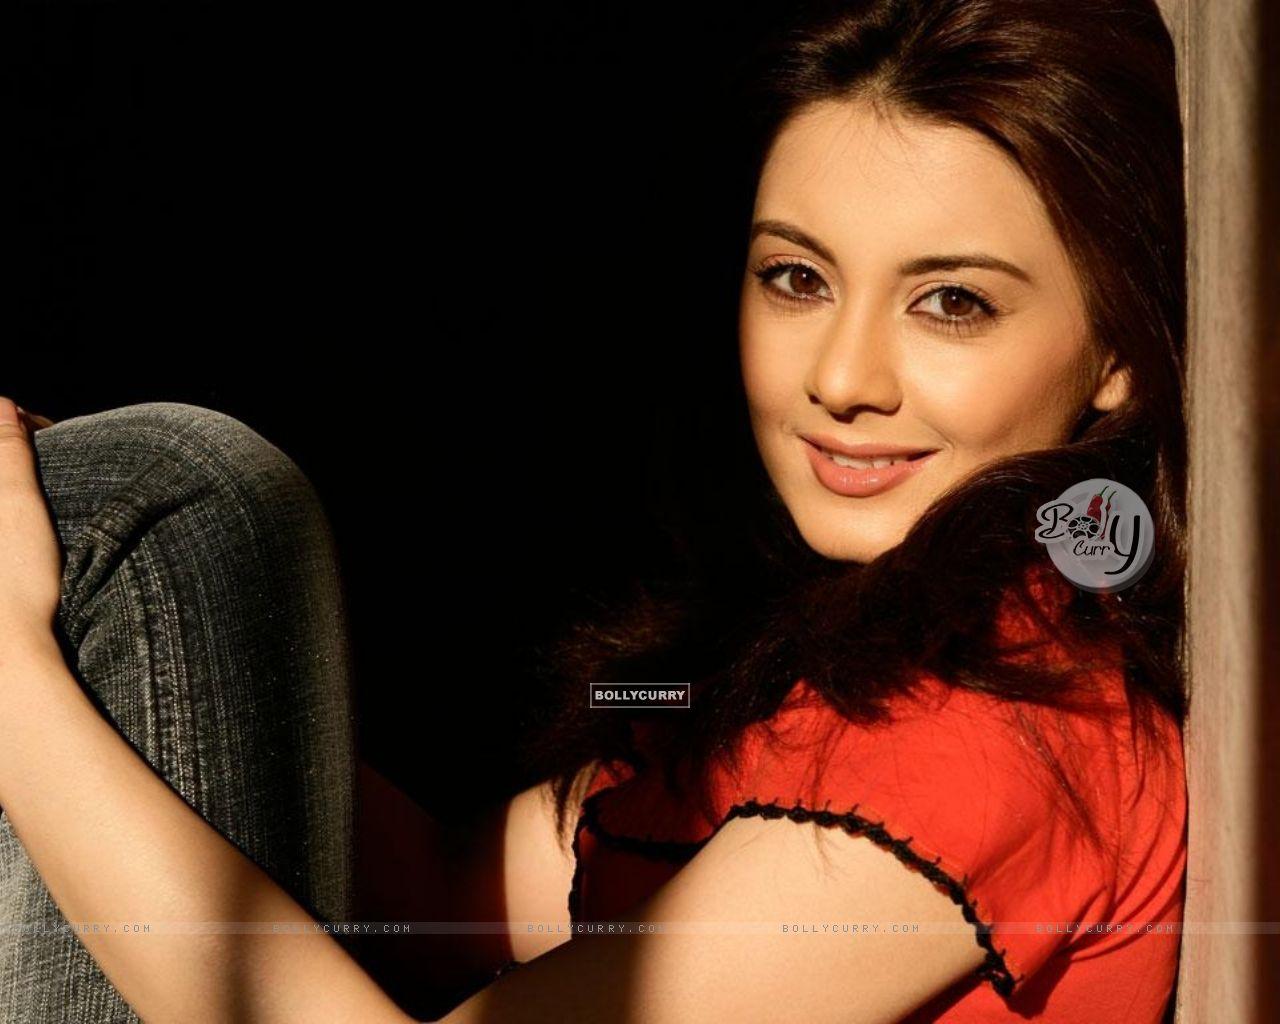 M Photo of minisha lamba